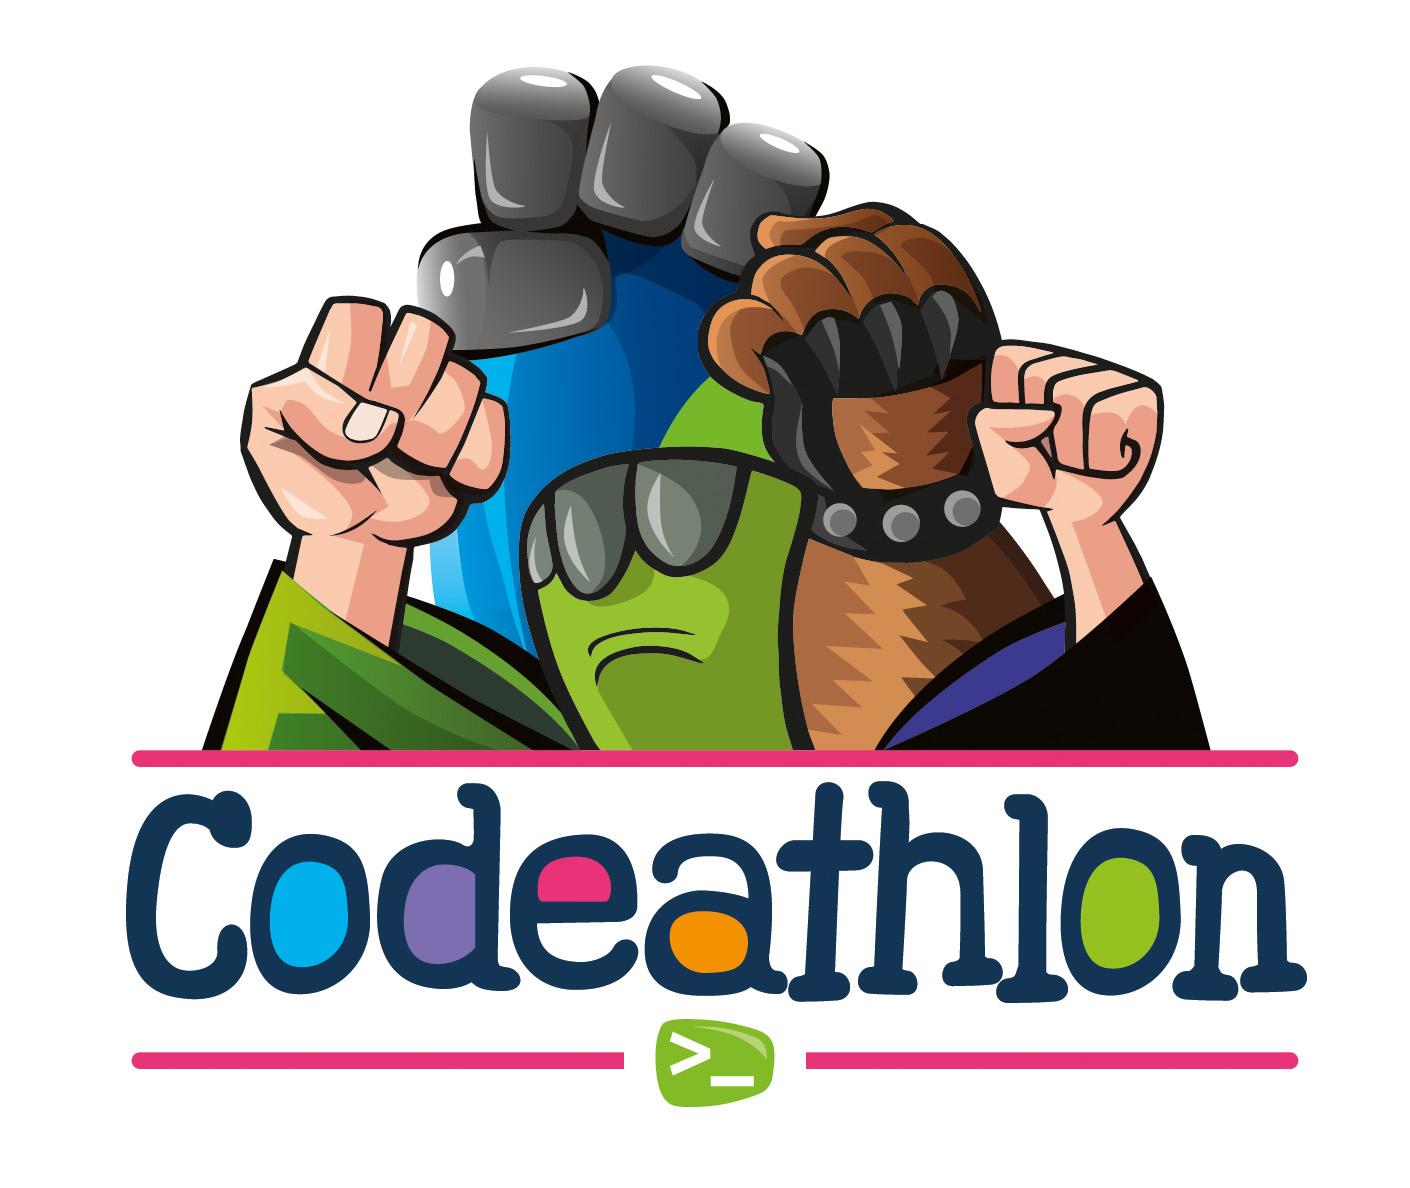 Codeathlon